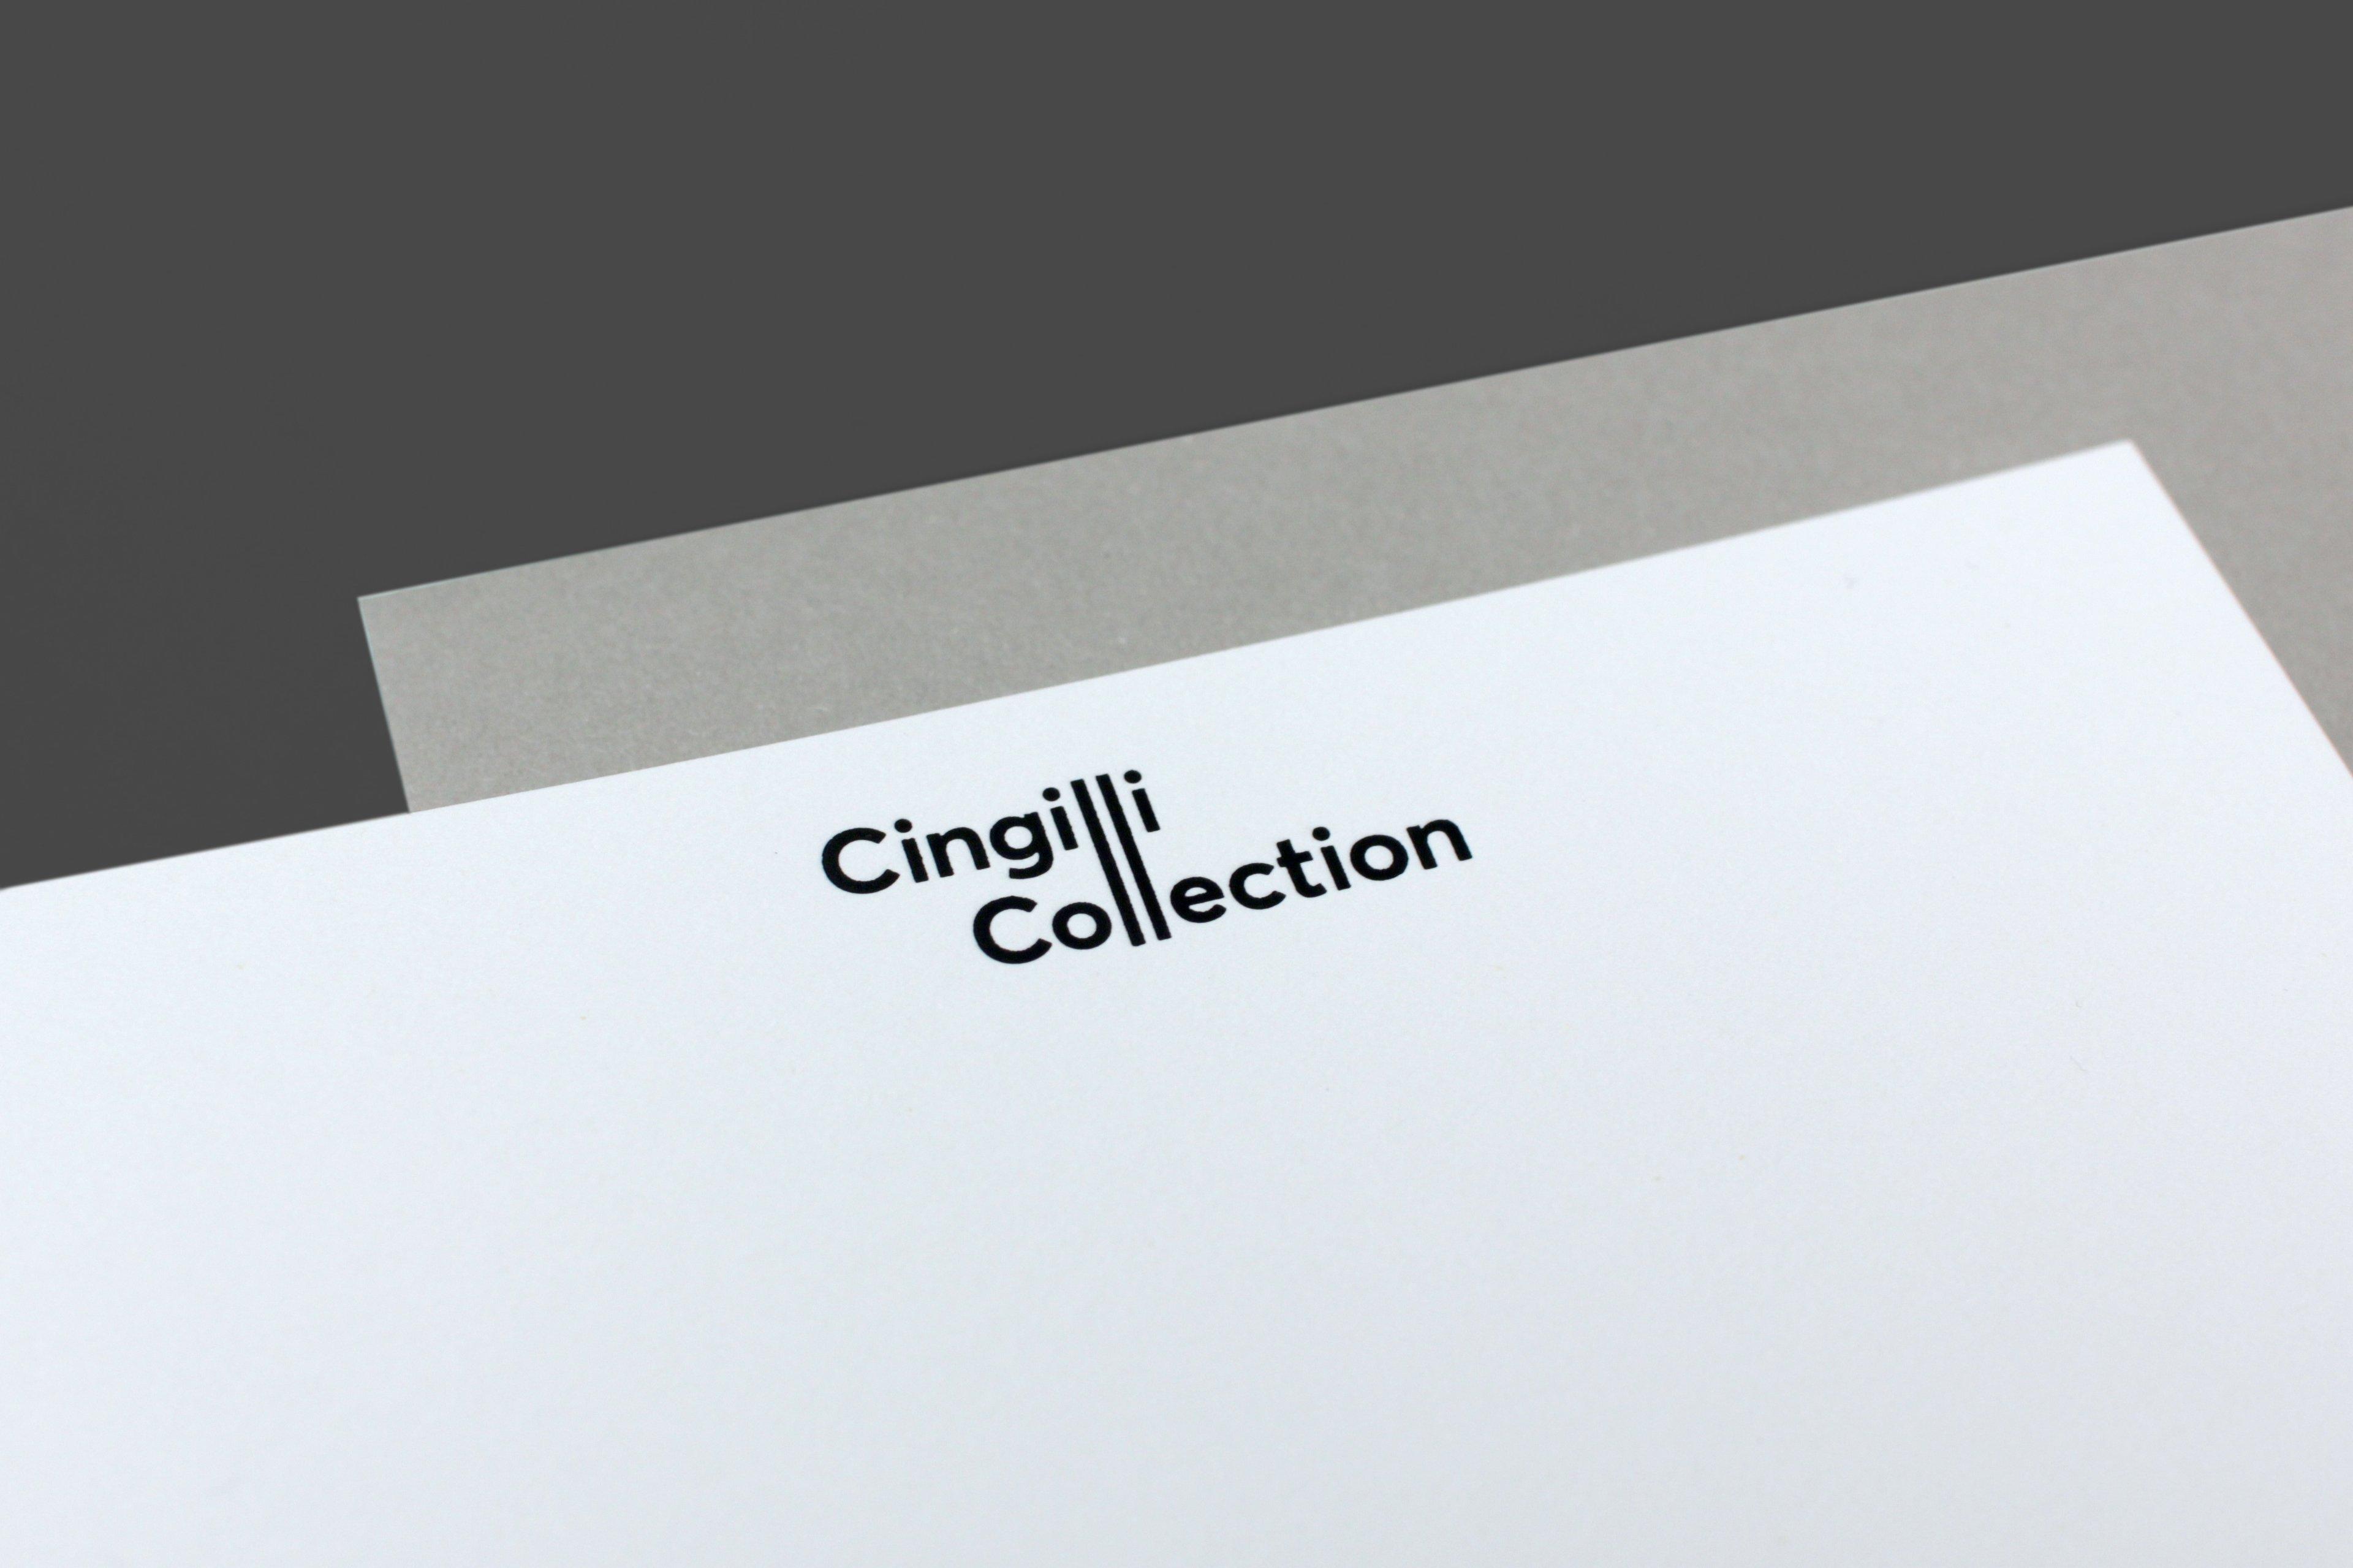 Cingilli_WEB_5.jpg